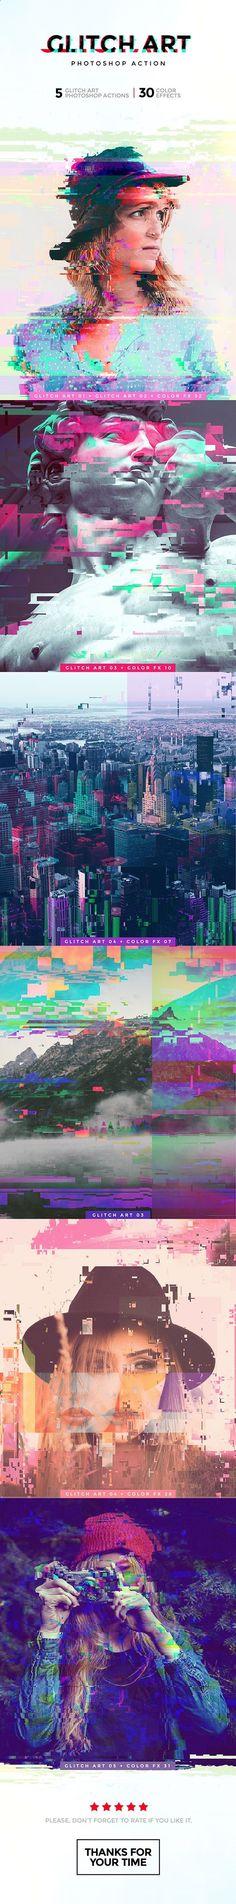 Glitch Art Photoshop Action — Photoshop ATN #instagram #colors • Download ➝ graphicriver.net/...